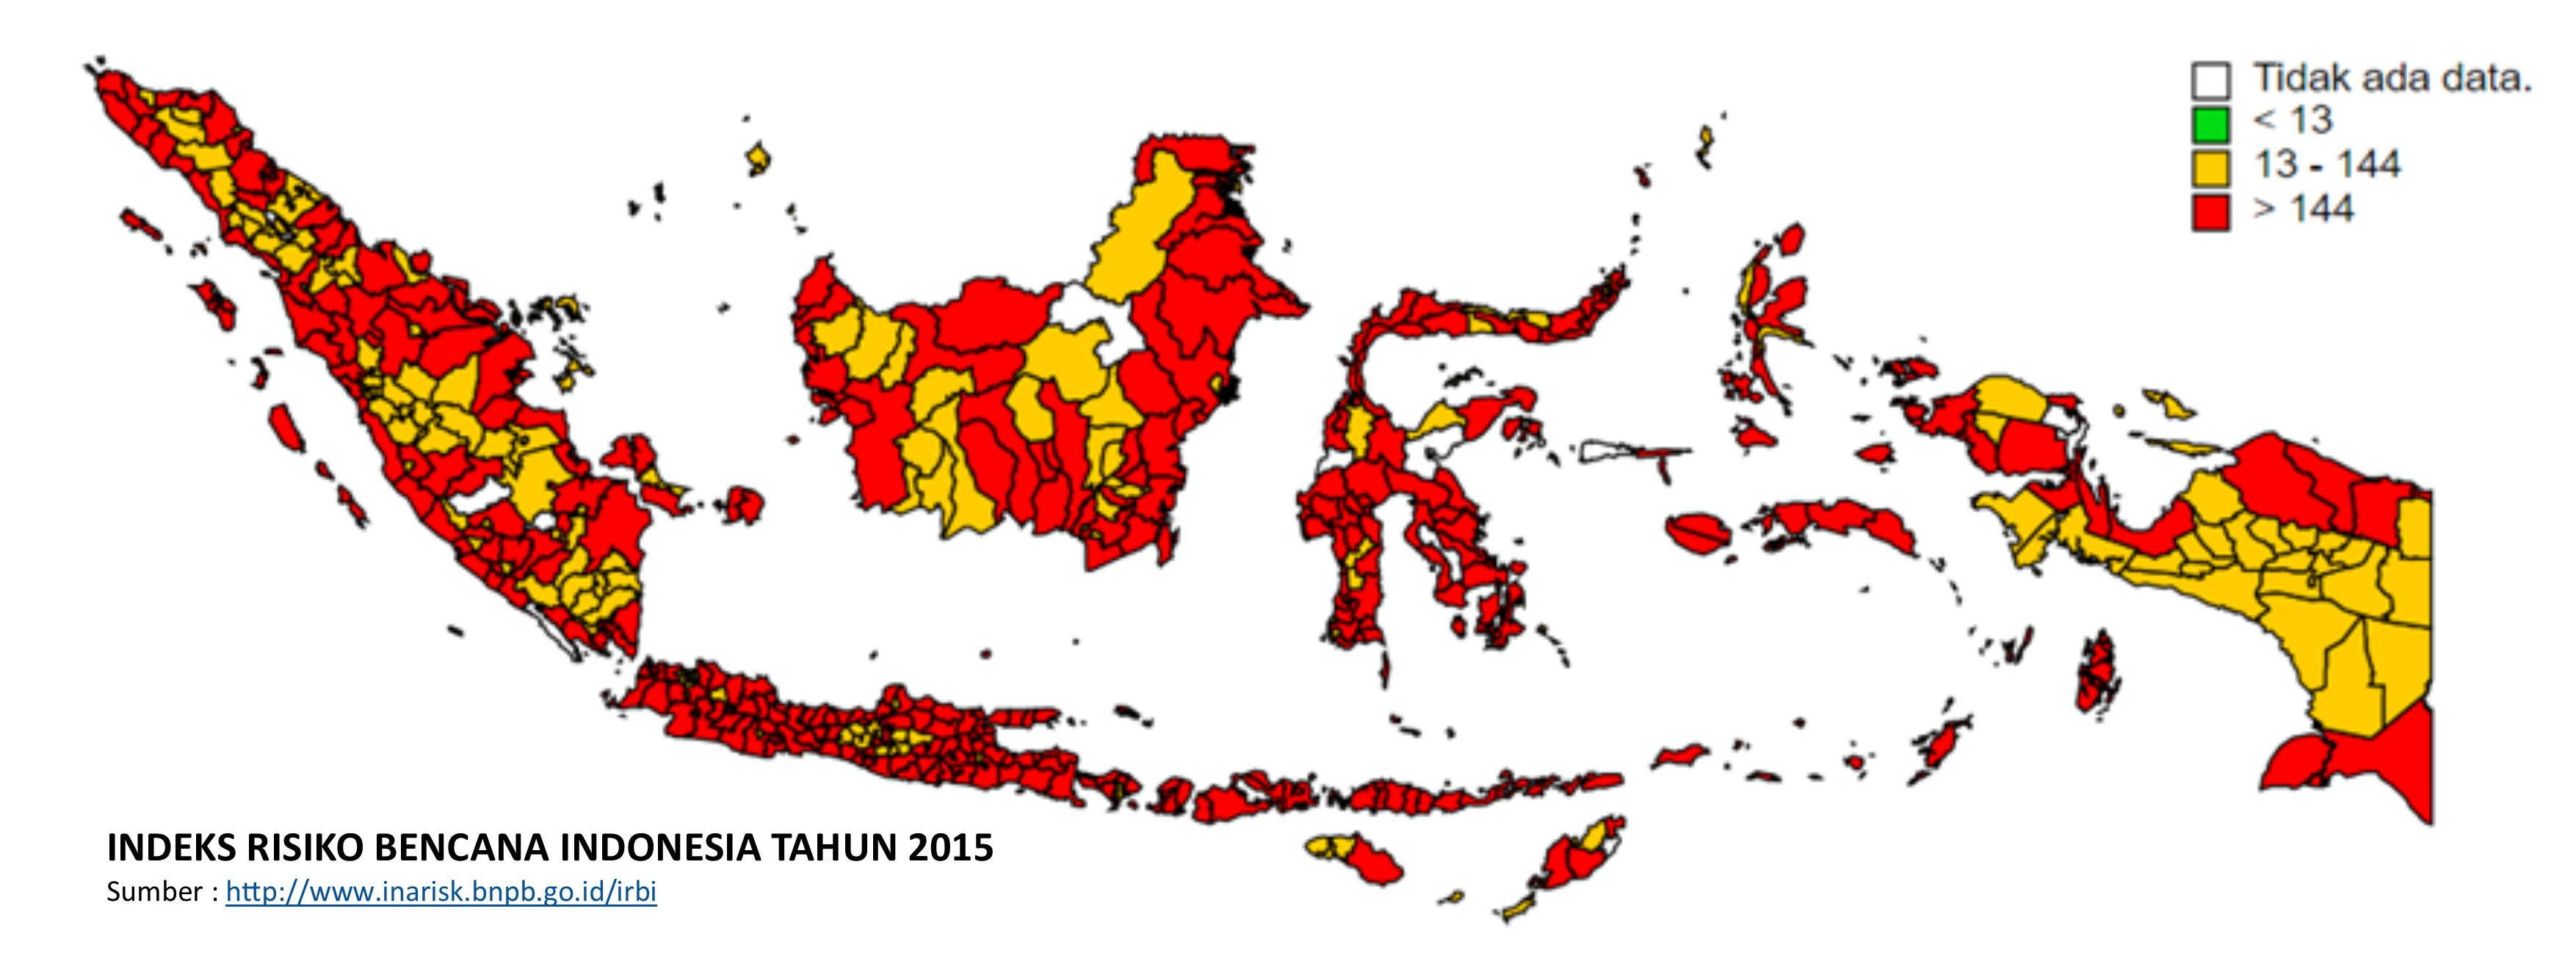 Indeks Risiko Bencana Indonesia 2015